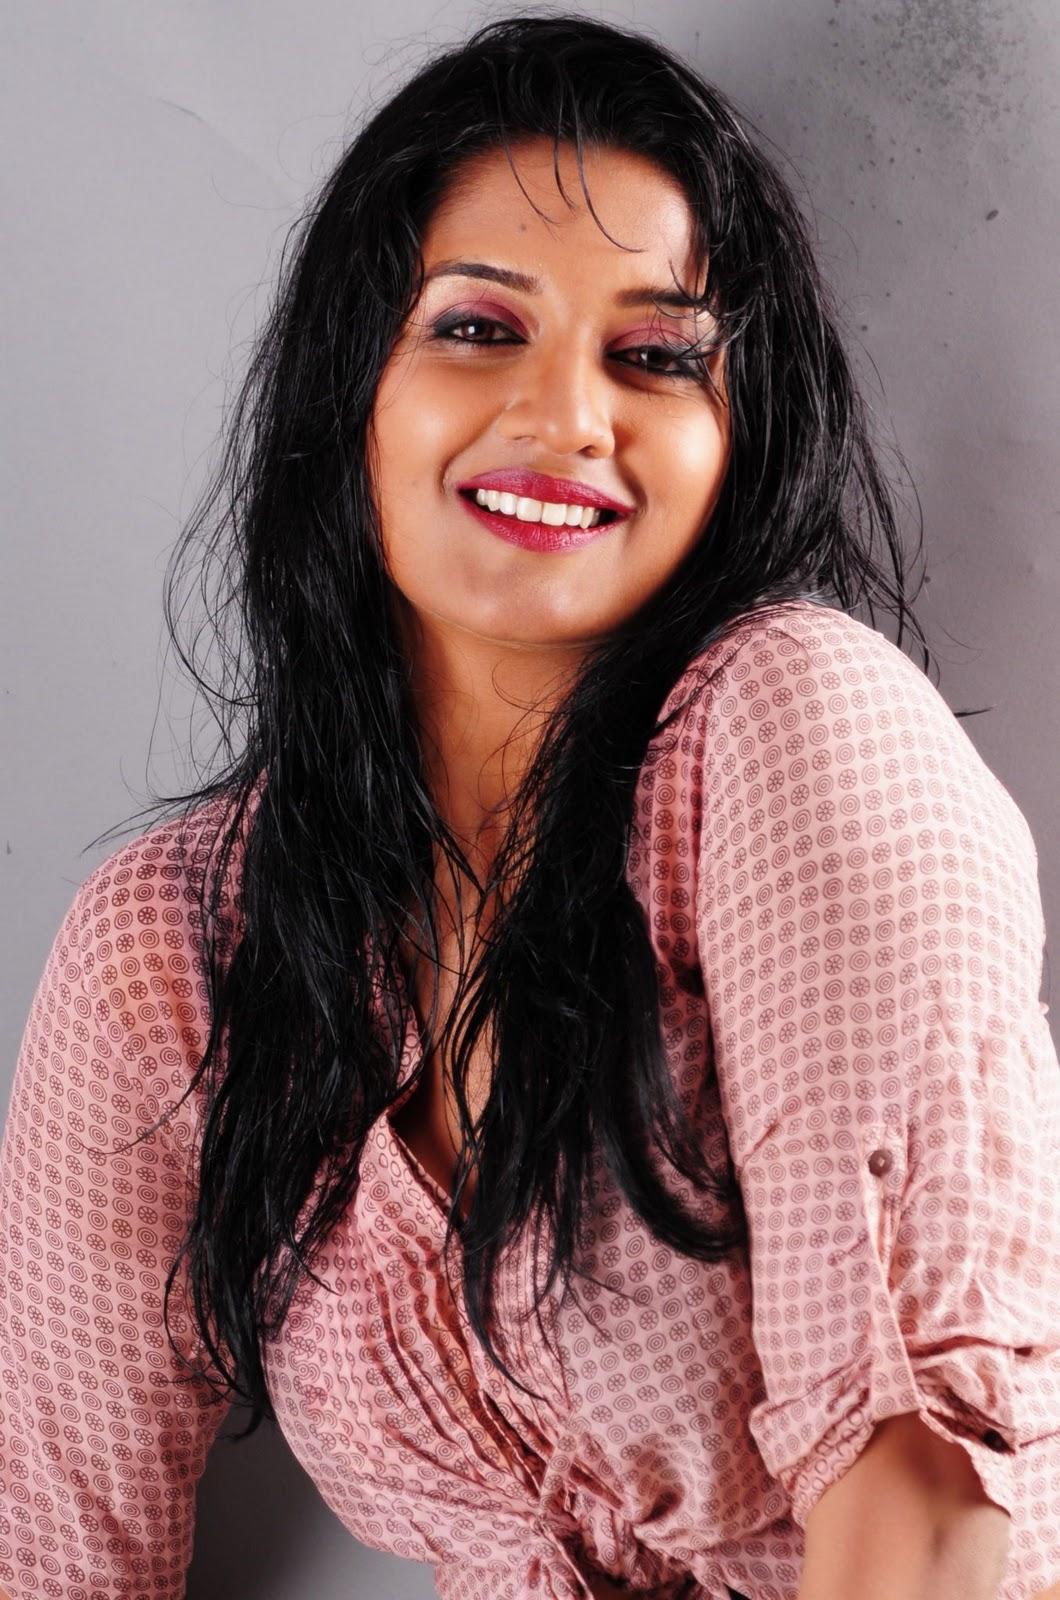 http://2.bp.blogspot.com/-TrqyXR8f8jY/TxTkdSv6NxI/AAAAAAAAHrg/gtsQHE0M8bM/s1600/Tamil+Actress+Vimala+Raman+smiling+Photos.JPG